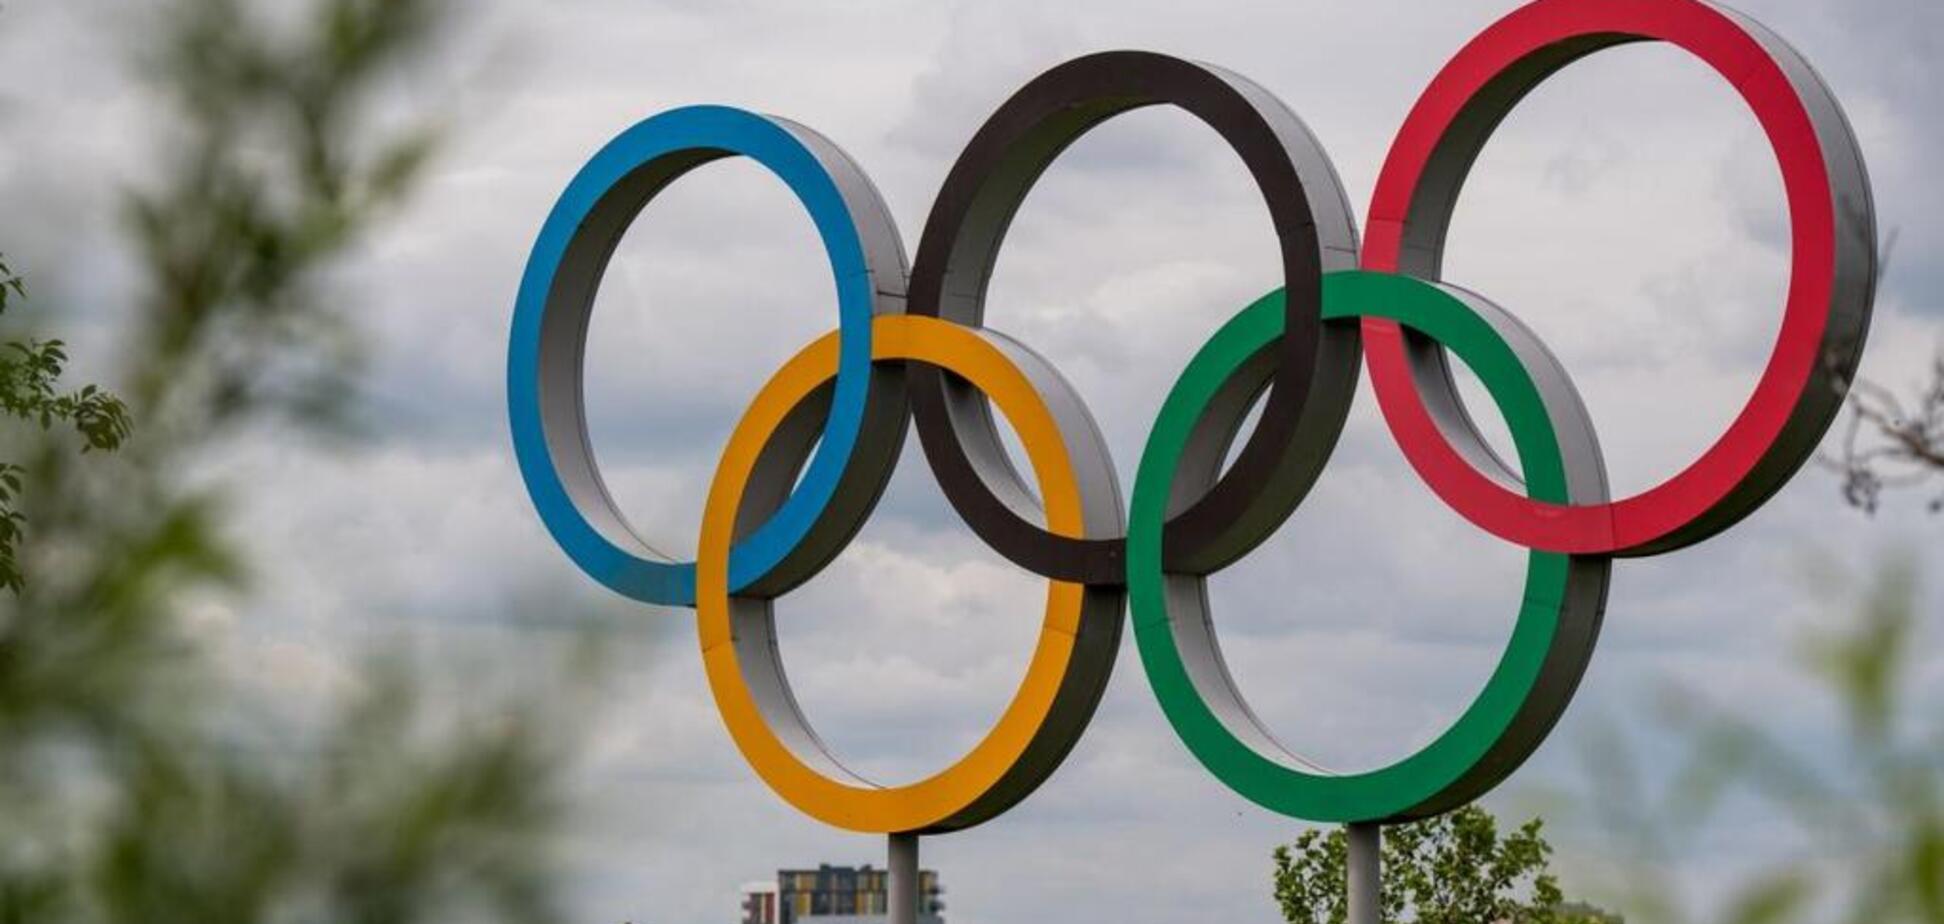 Спільна Олімпіада України та Білорусі